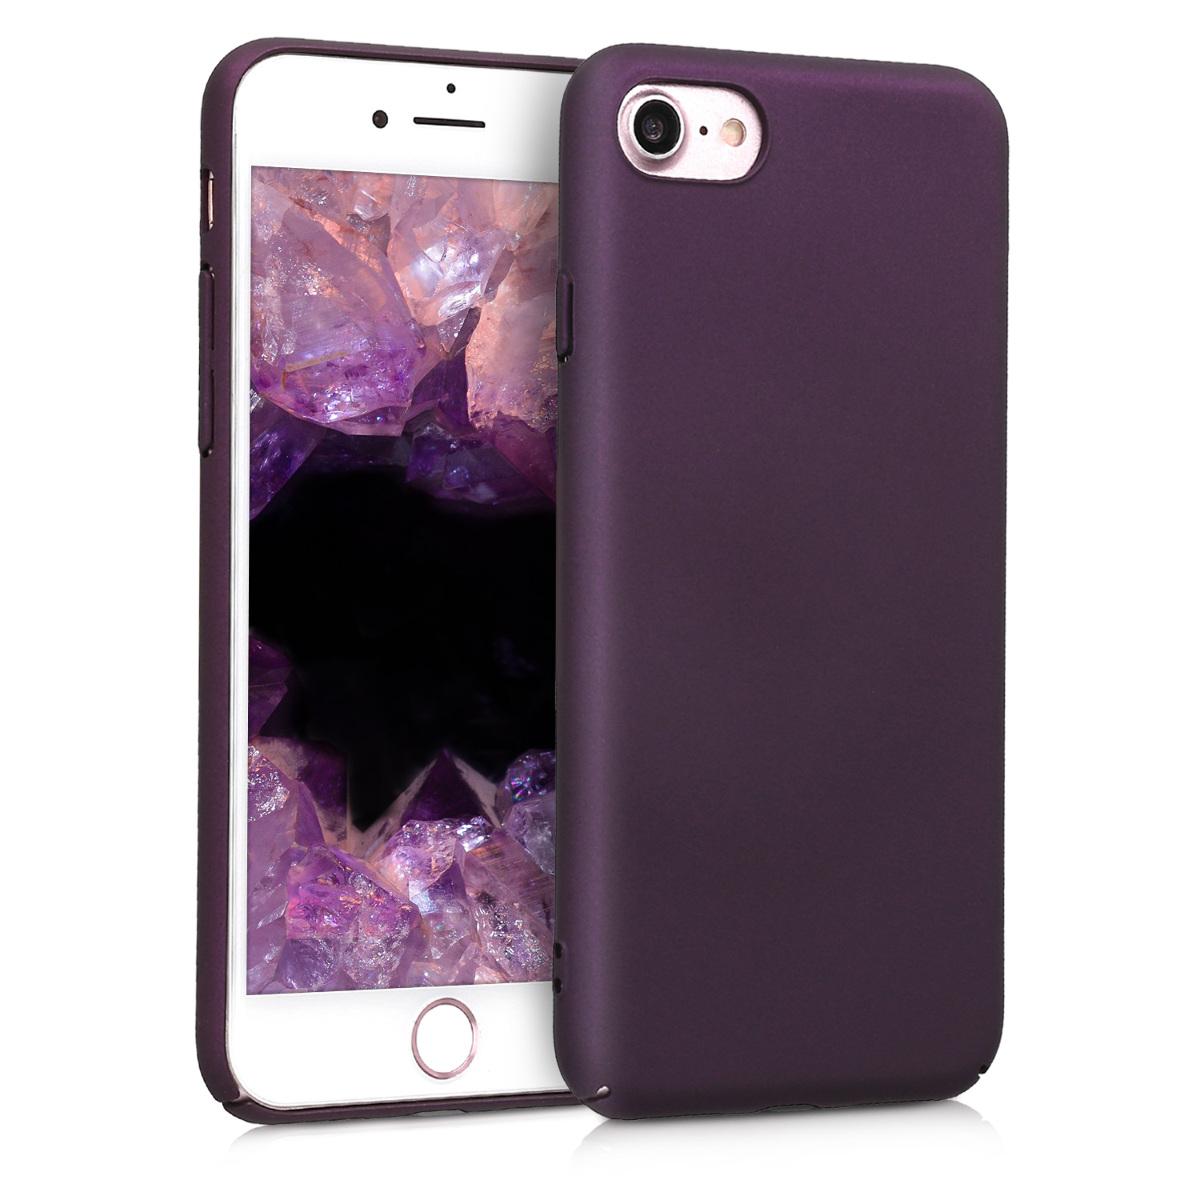 KW Slim Anti-Slip Cover - Σκληρή Θήκη Καουτσούκ iPhone 8 / 7 - Metallic Berry (42428.115)